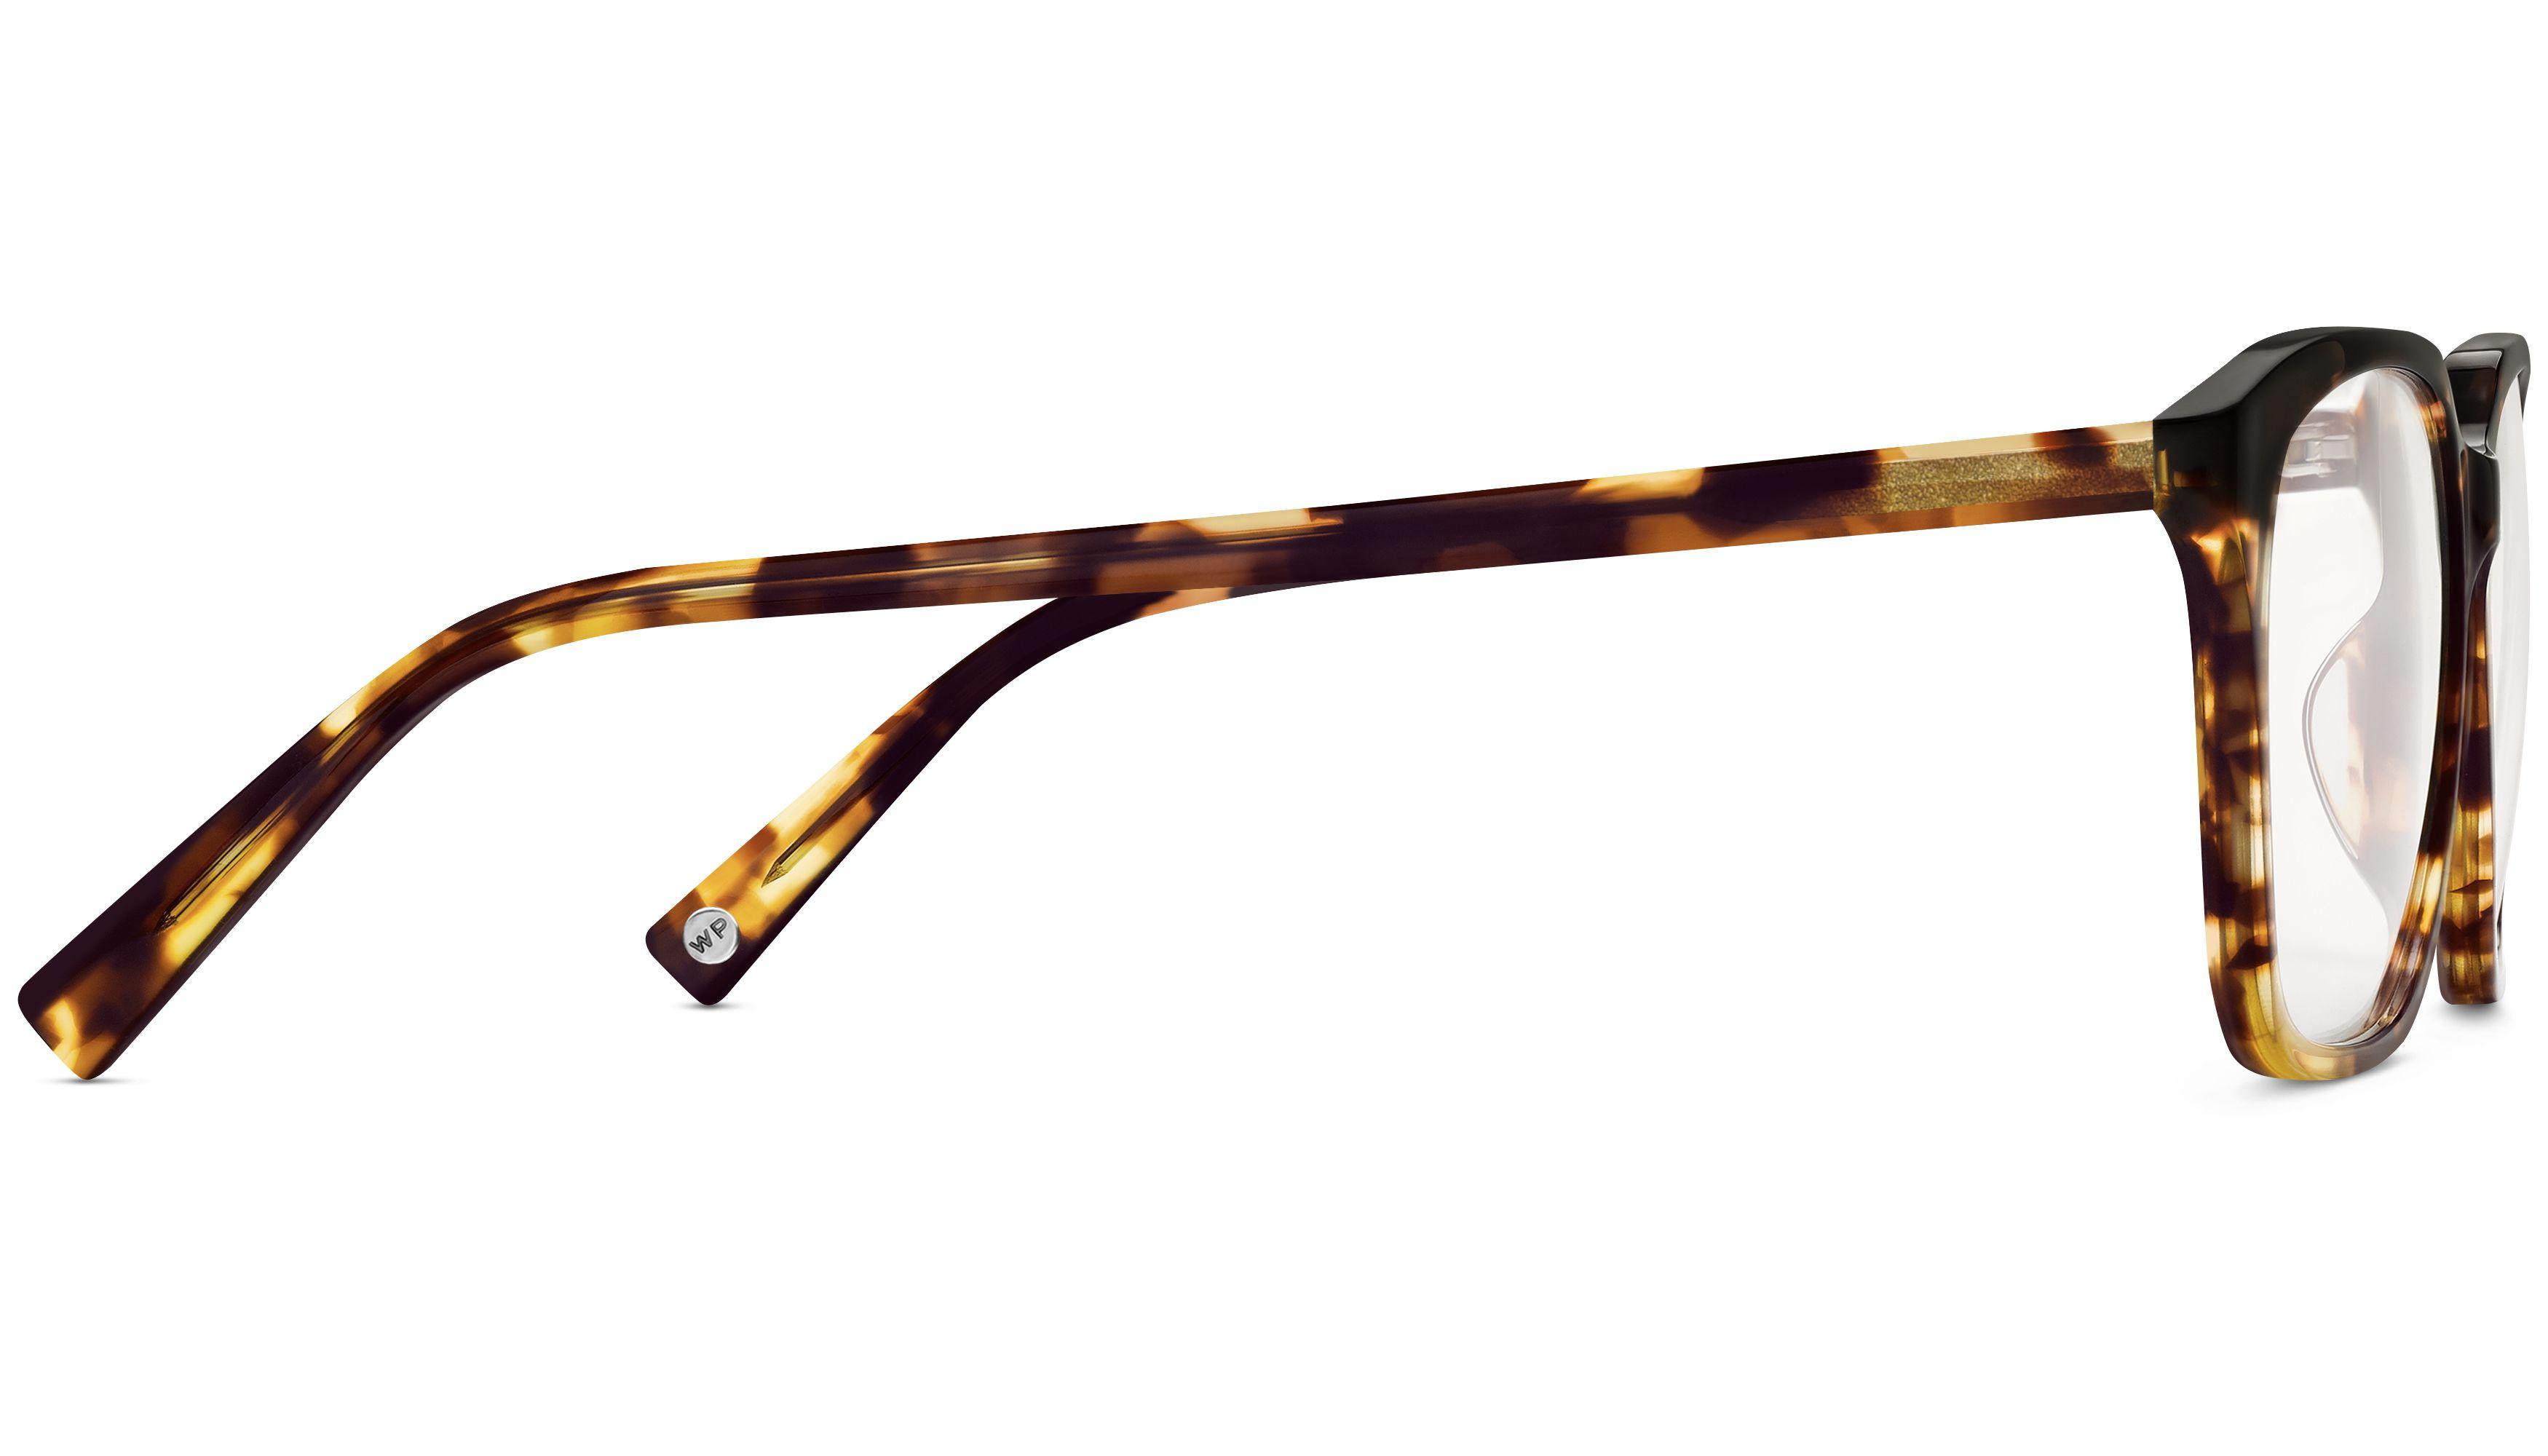 Barnes Eyeglasses in Root Beer for Men   Warby Parker